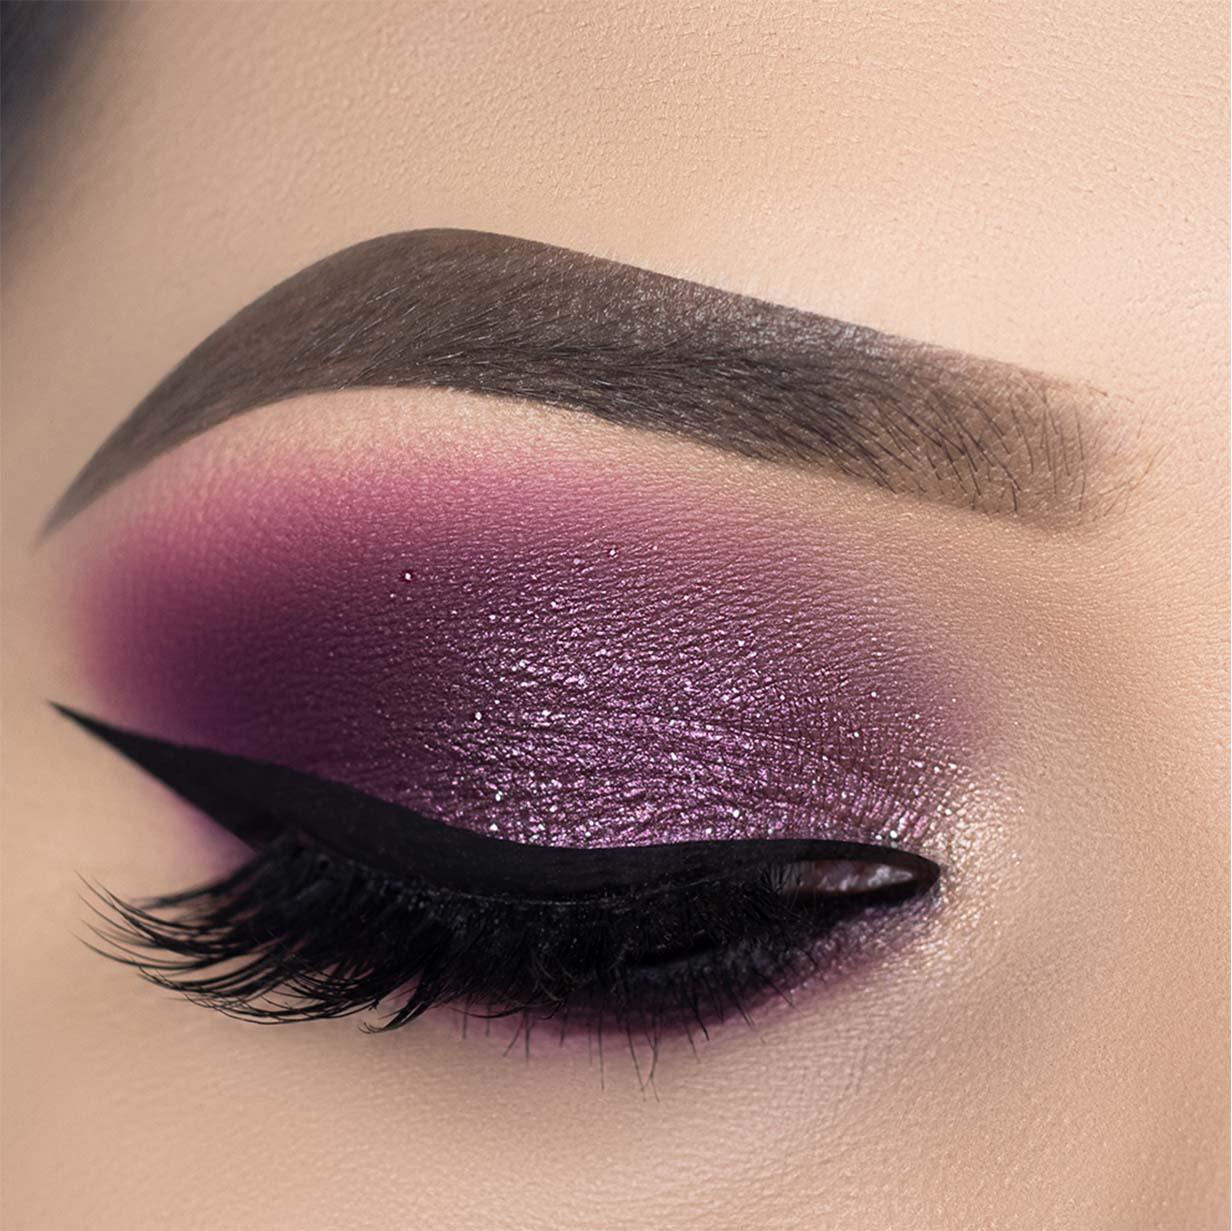 Asa de Borboleta Pigmento Suelen Makeup Vintage  - SUELEN MAKEUP